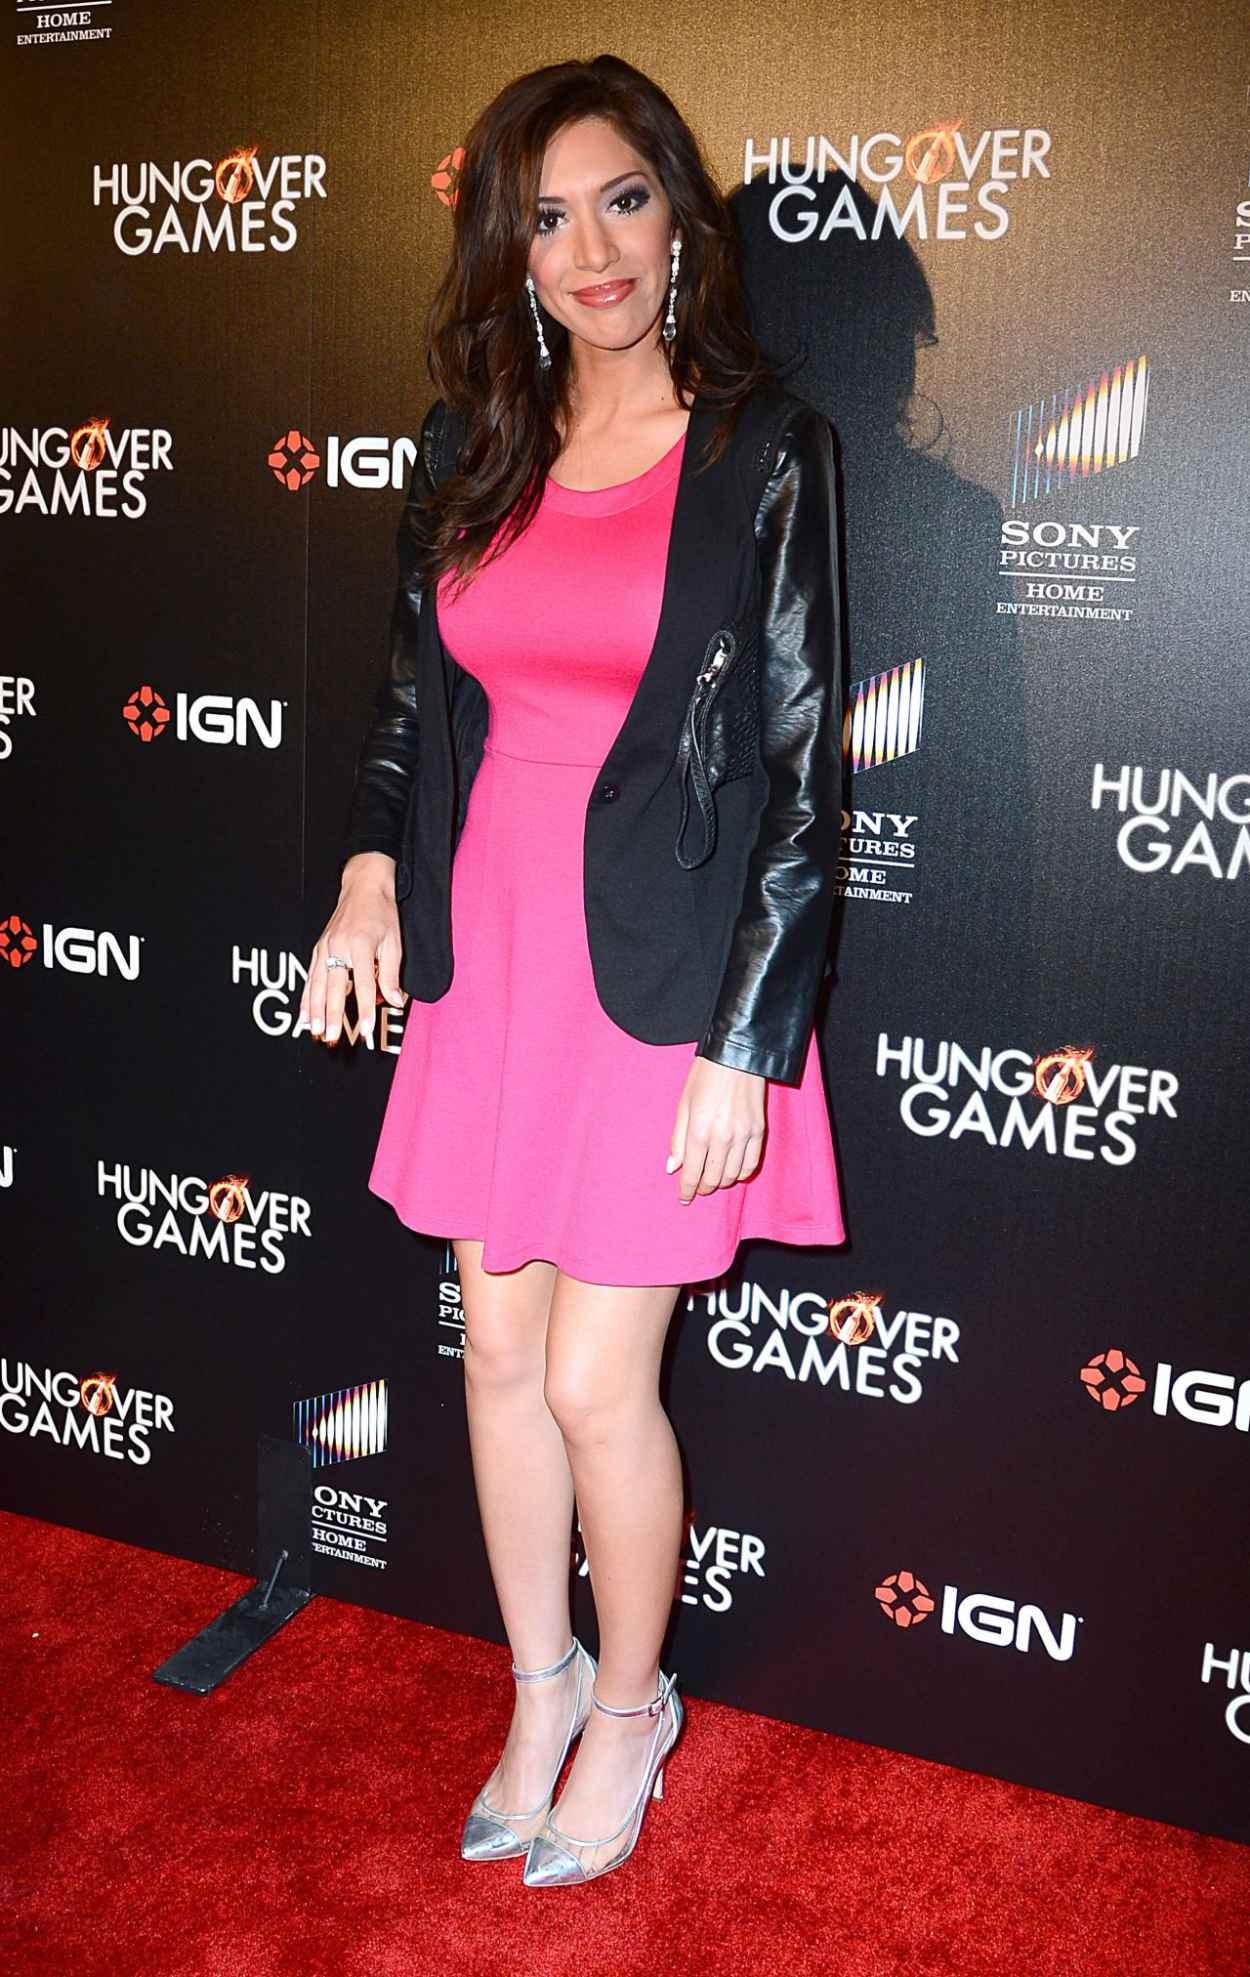 Farrah Abraham - The Hungover Games Los Angeles Premiere - Feb. 2015-1